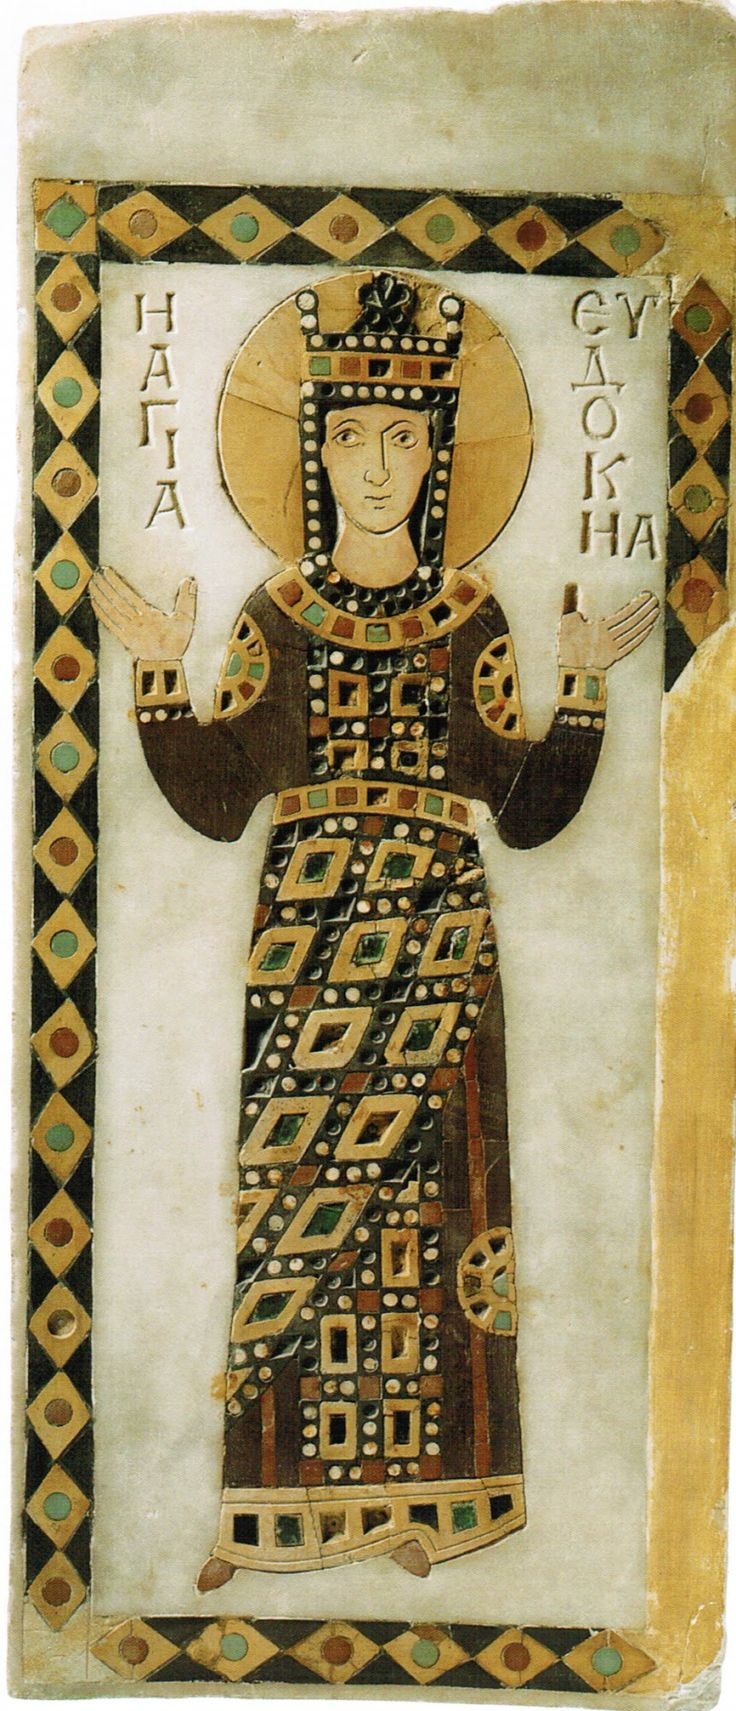 11th Century Byzantine Clothing Construction - A very good class handout regarding Byzantine clothing